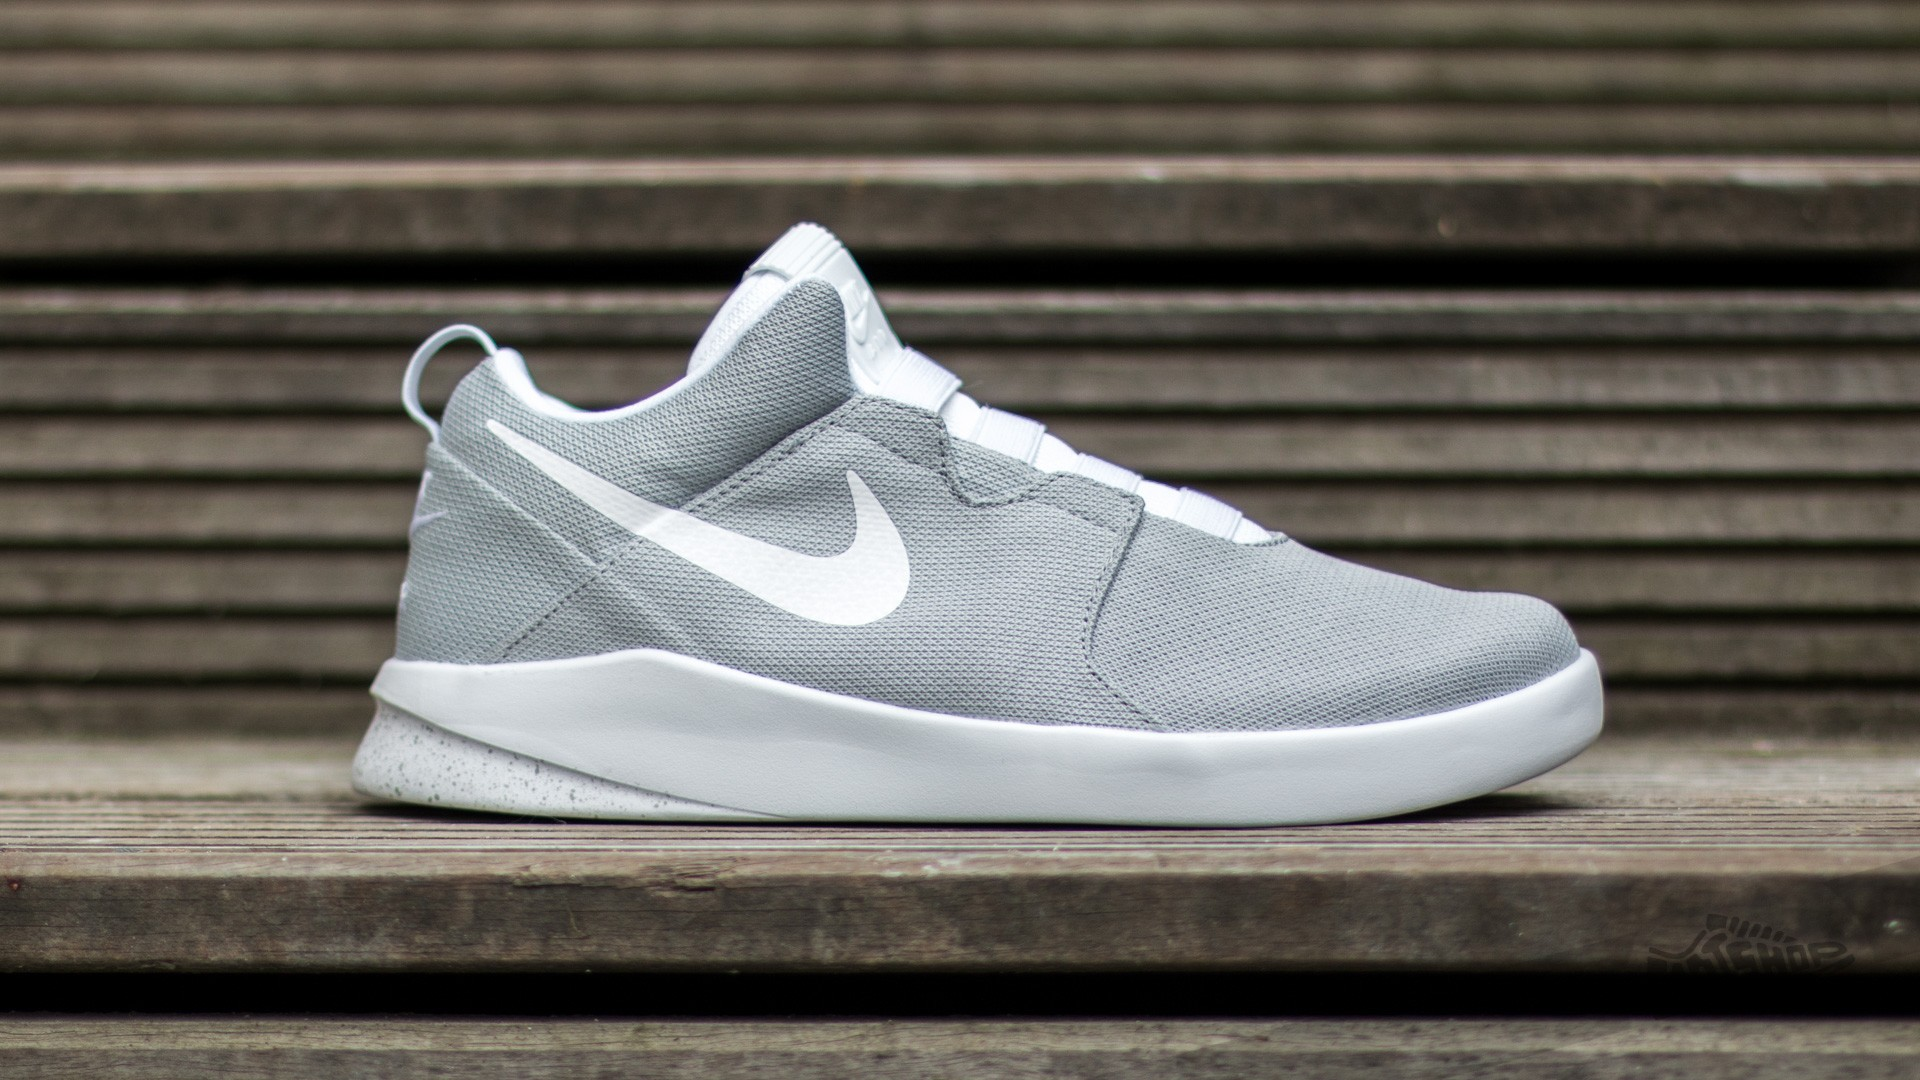 d9f8421f3099 Nike Air Shibusa Wolf Grey  White-Pure Platinum